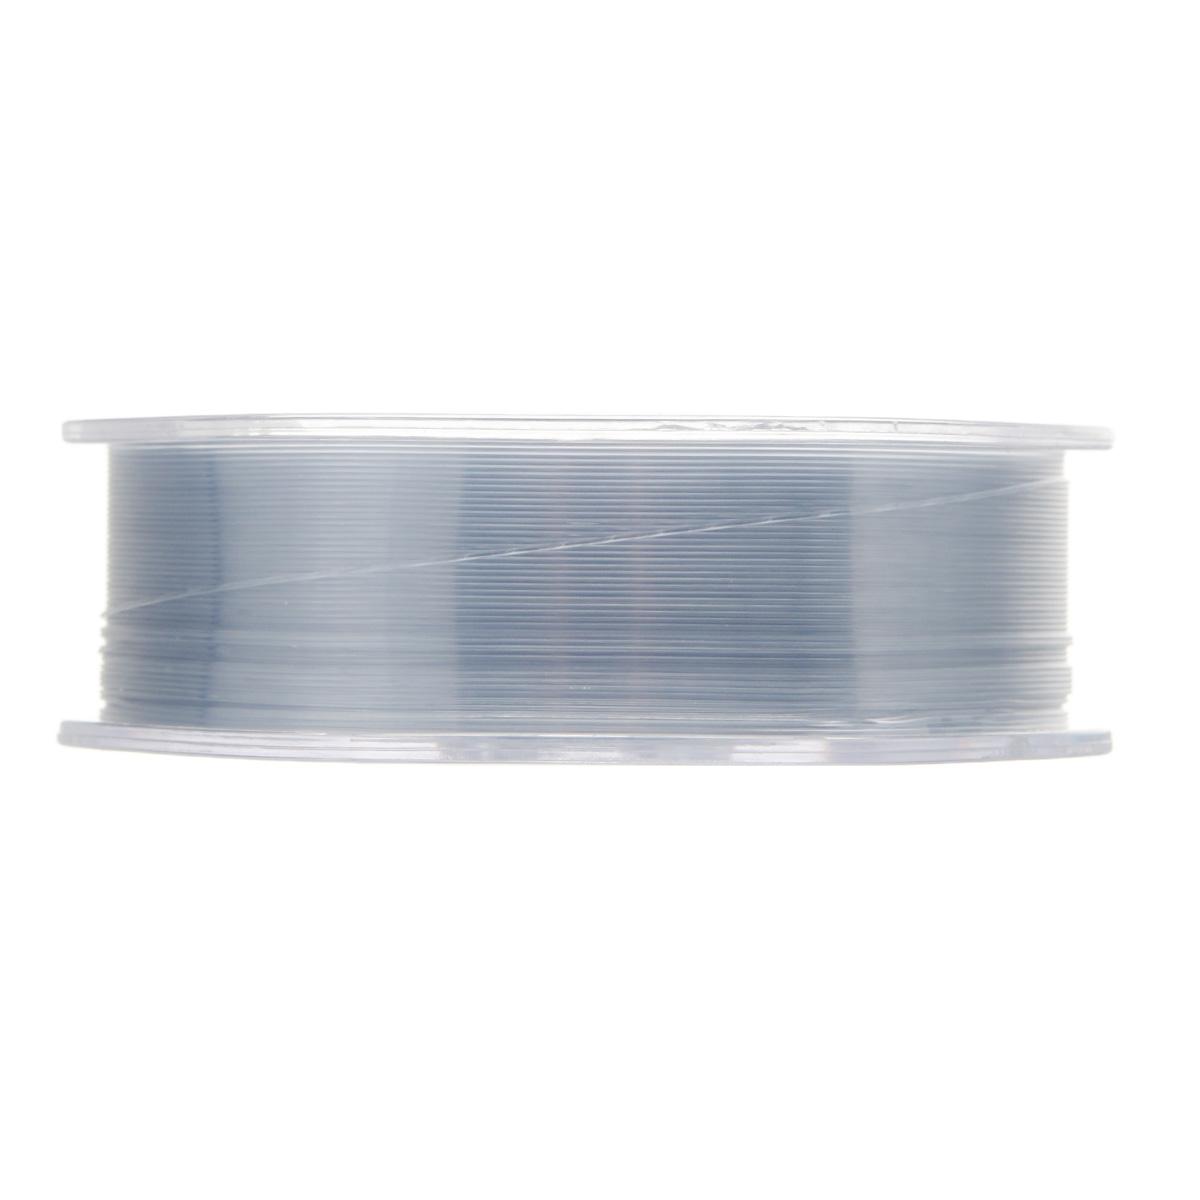 "Леска Allvega ""ZDX Special Spin"", цвет: светло-серый, 100 м, 0,50 мм, 16,77 кг"